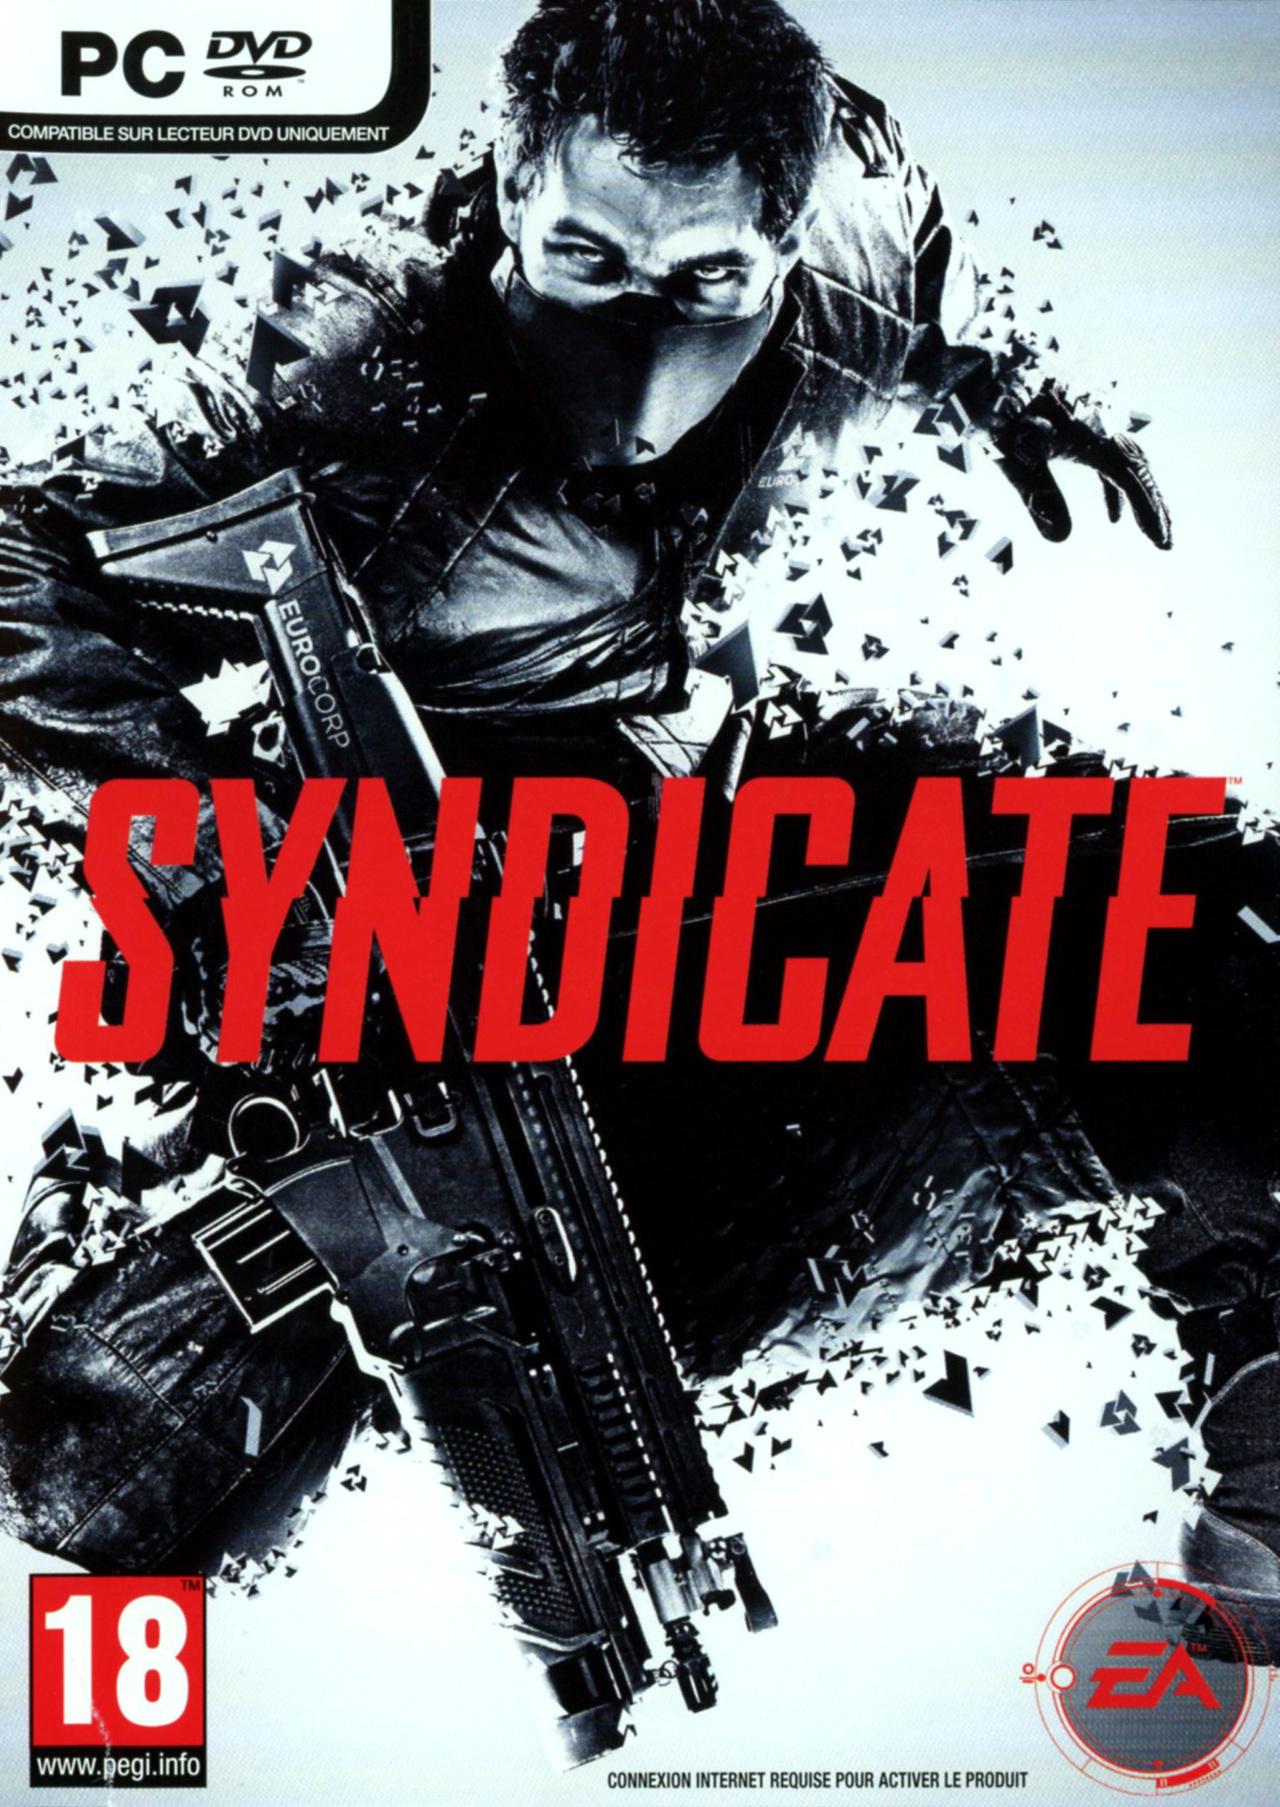 Syndicate Video Game 2012 Imdb